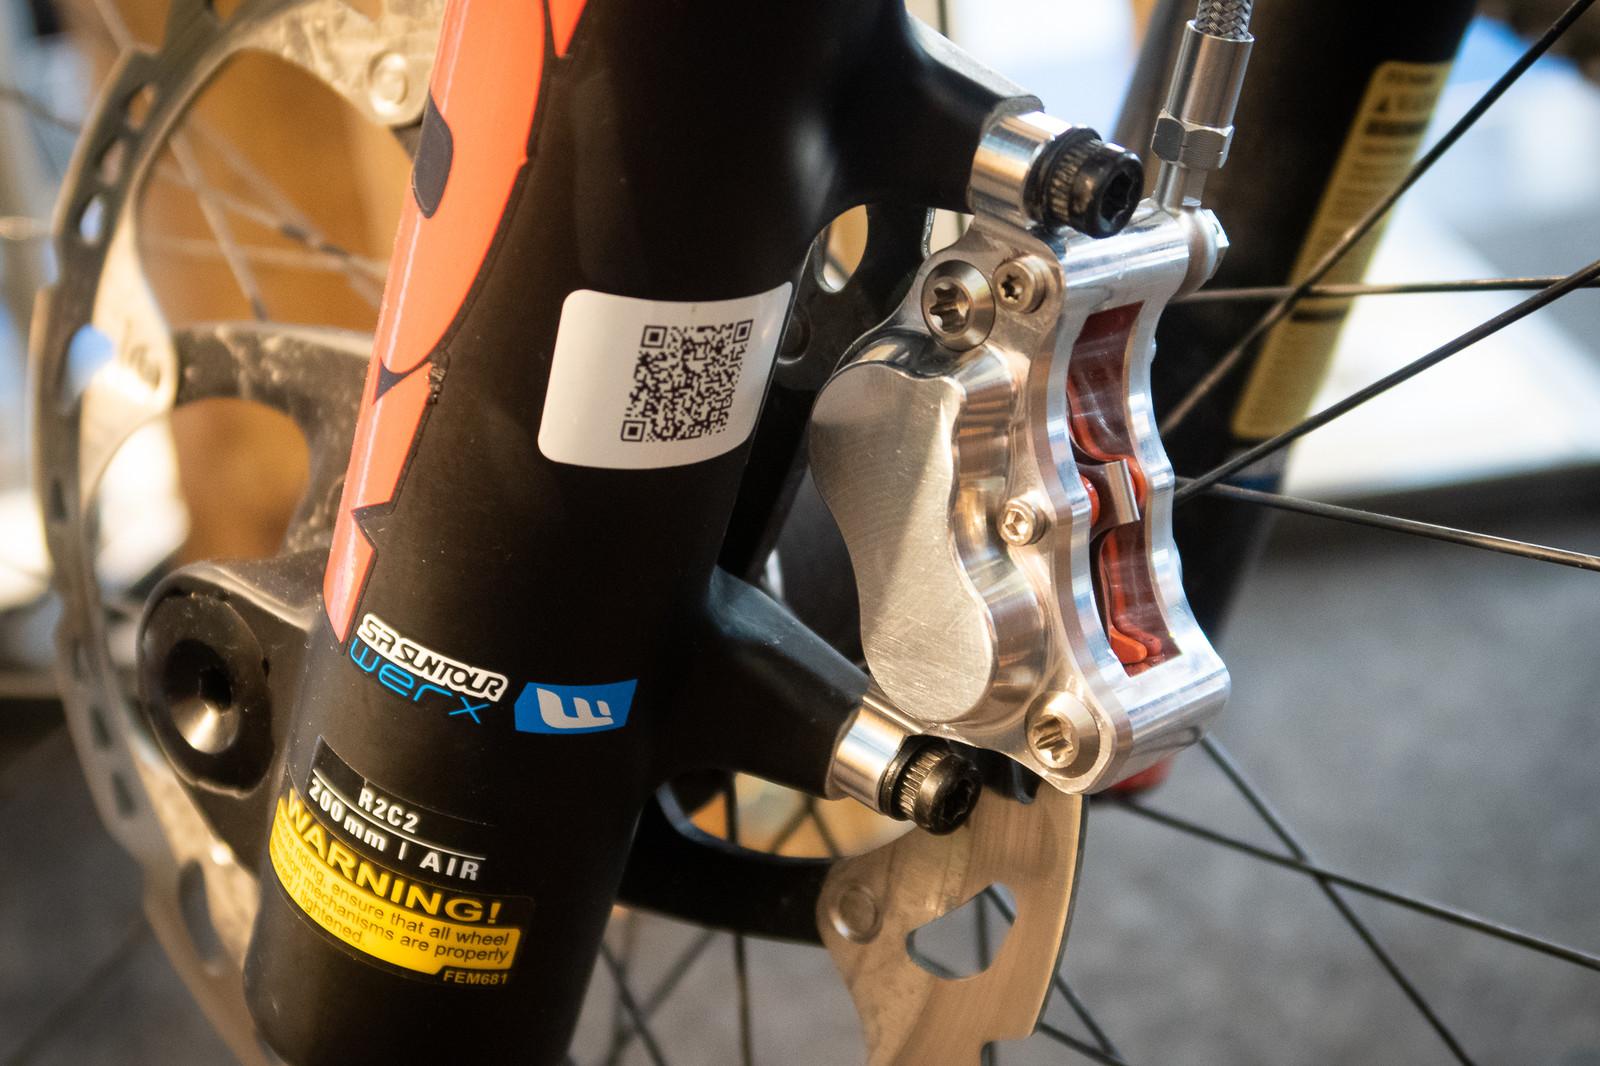 Trickstuff's New Direttissima Brakes at Eurobike